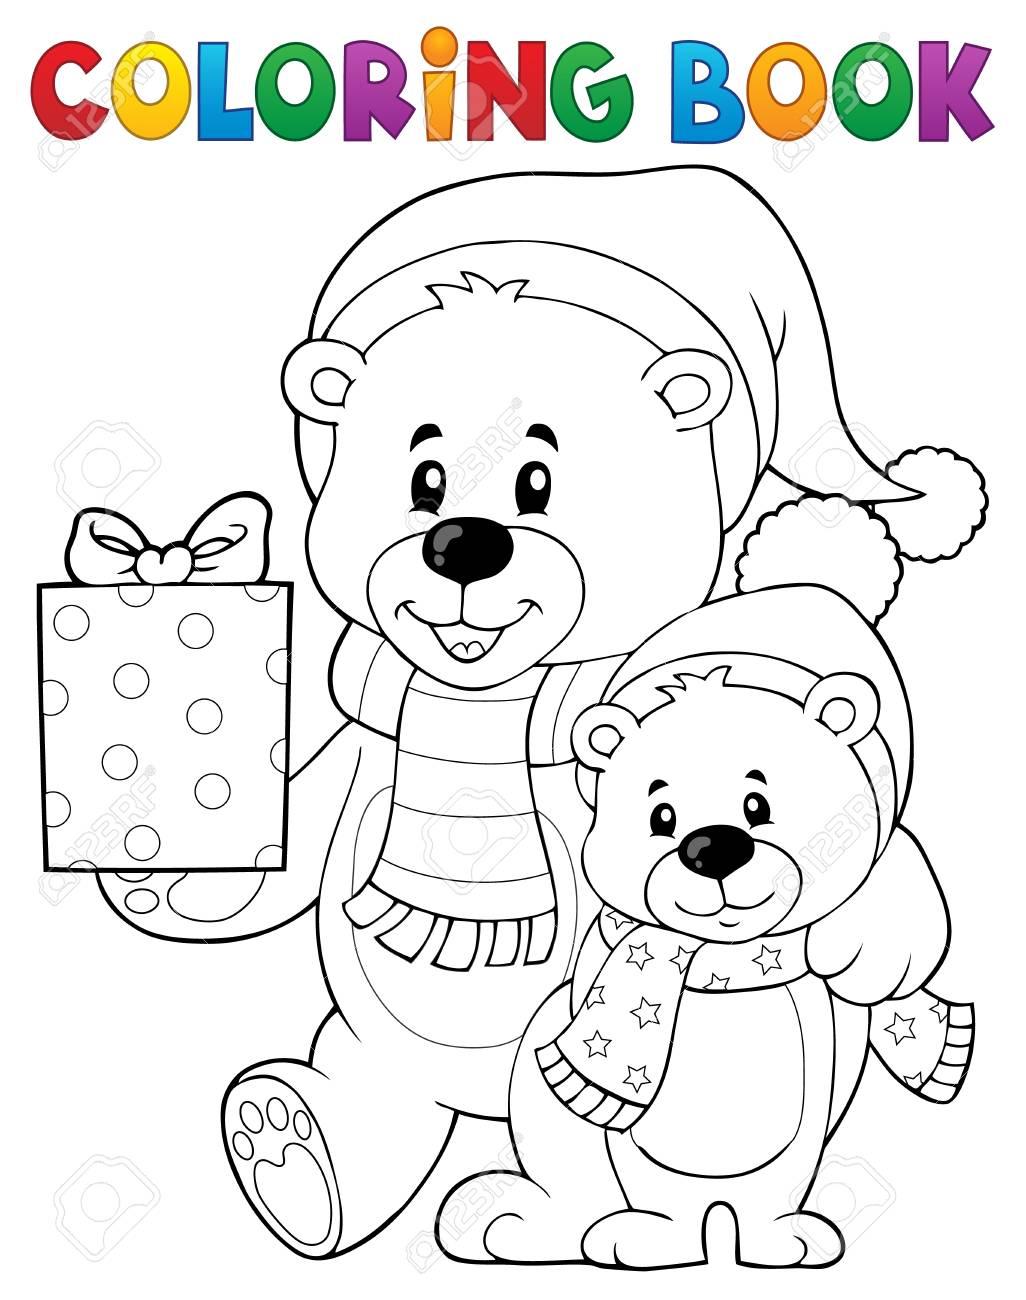 Coloring book Christmas bears theme 1 - eps10 vector illustration.